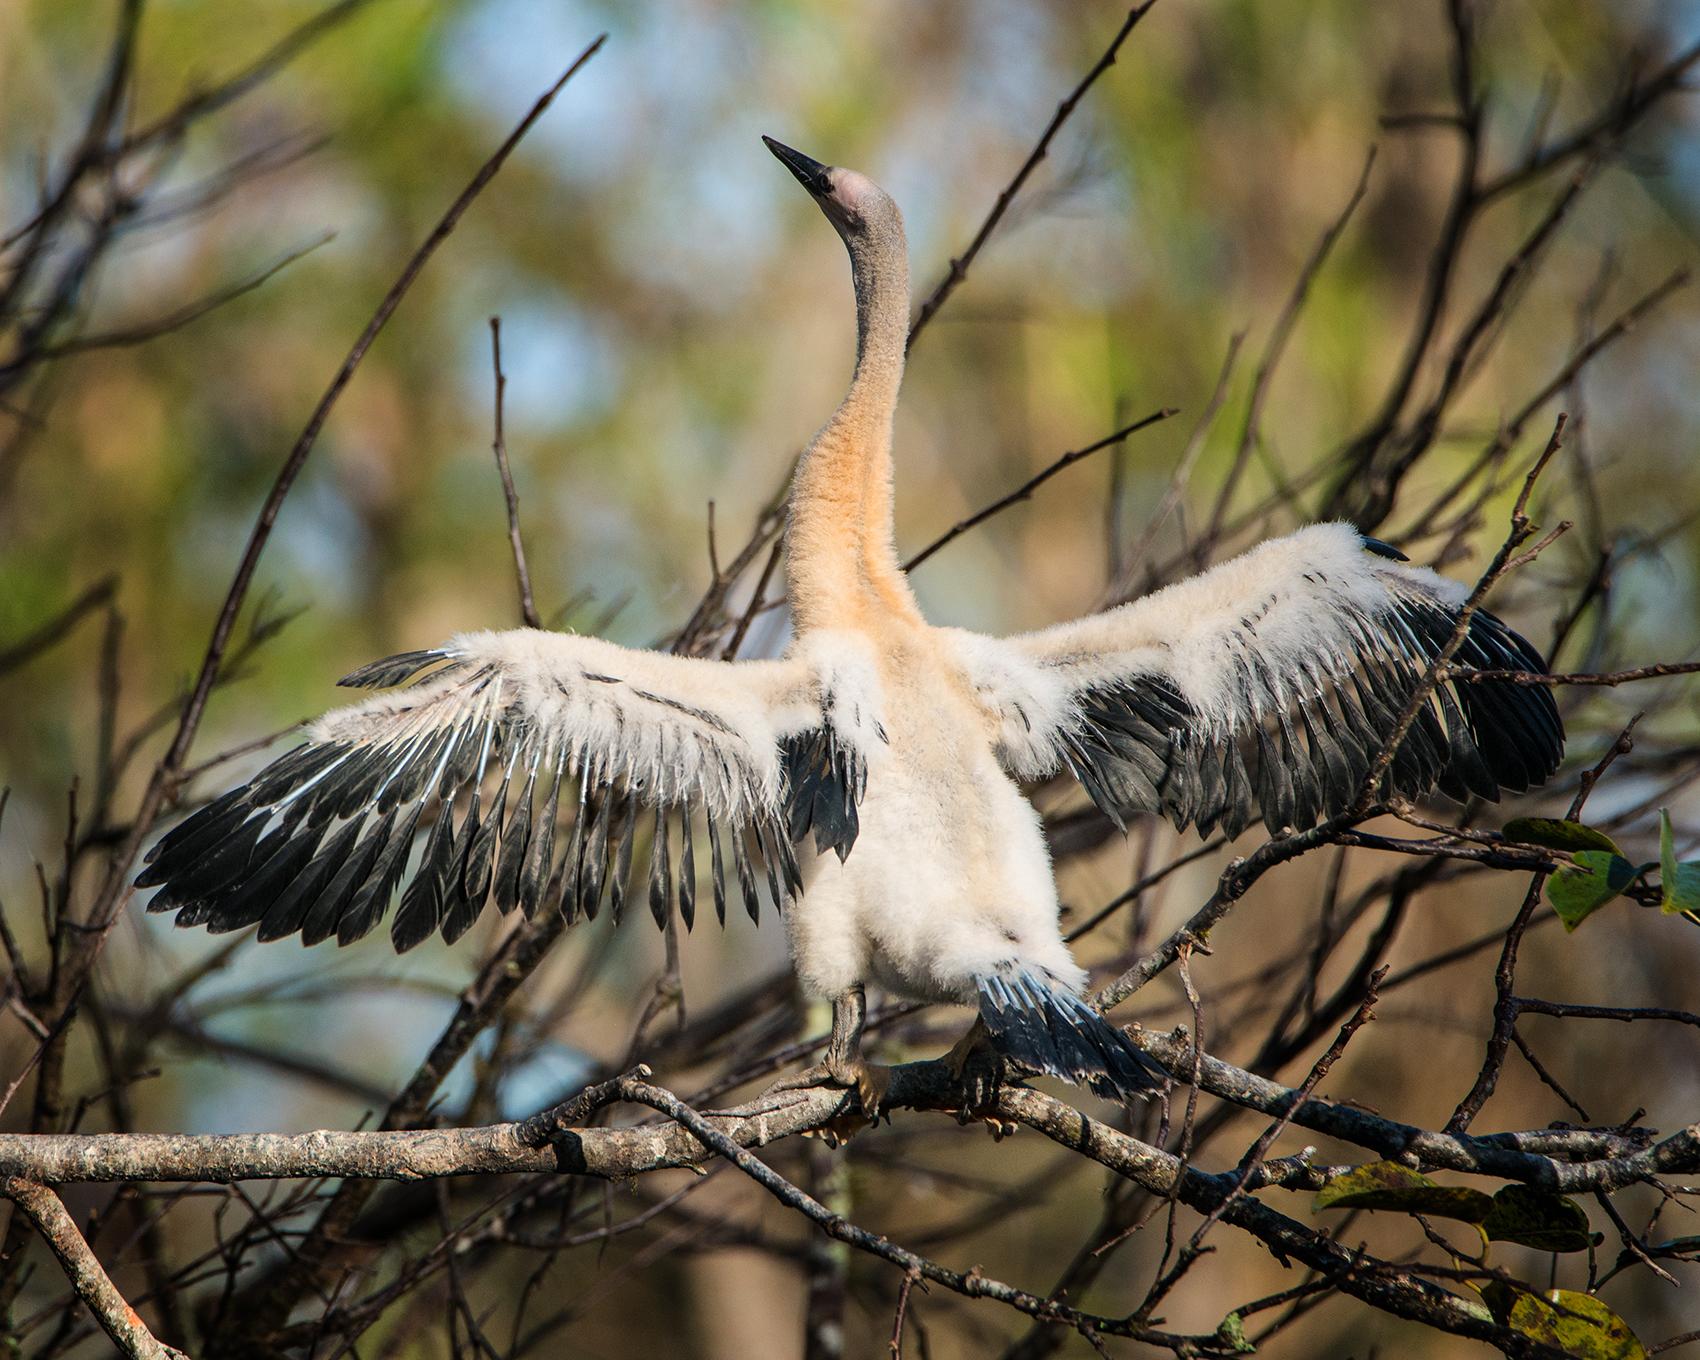 #anhinga, #baby, #onemonthold, #bird, #florida, #corkscrew